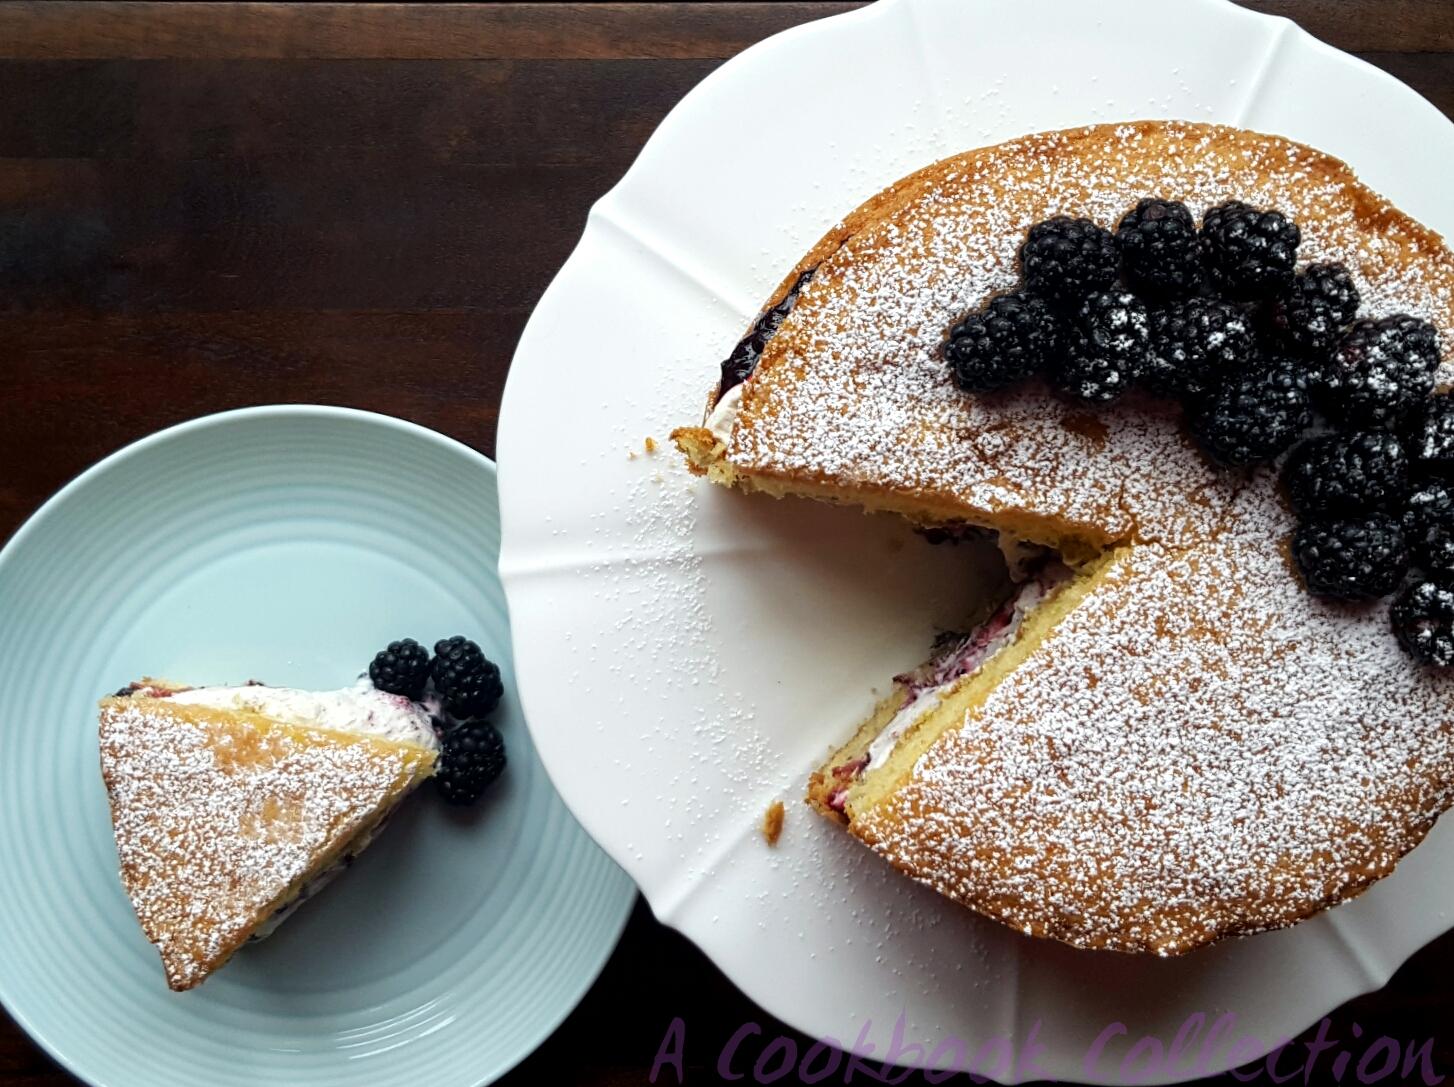 blackberry-sponge-cake-a-cookbook-collection